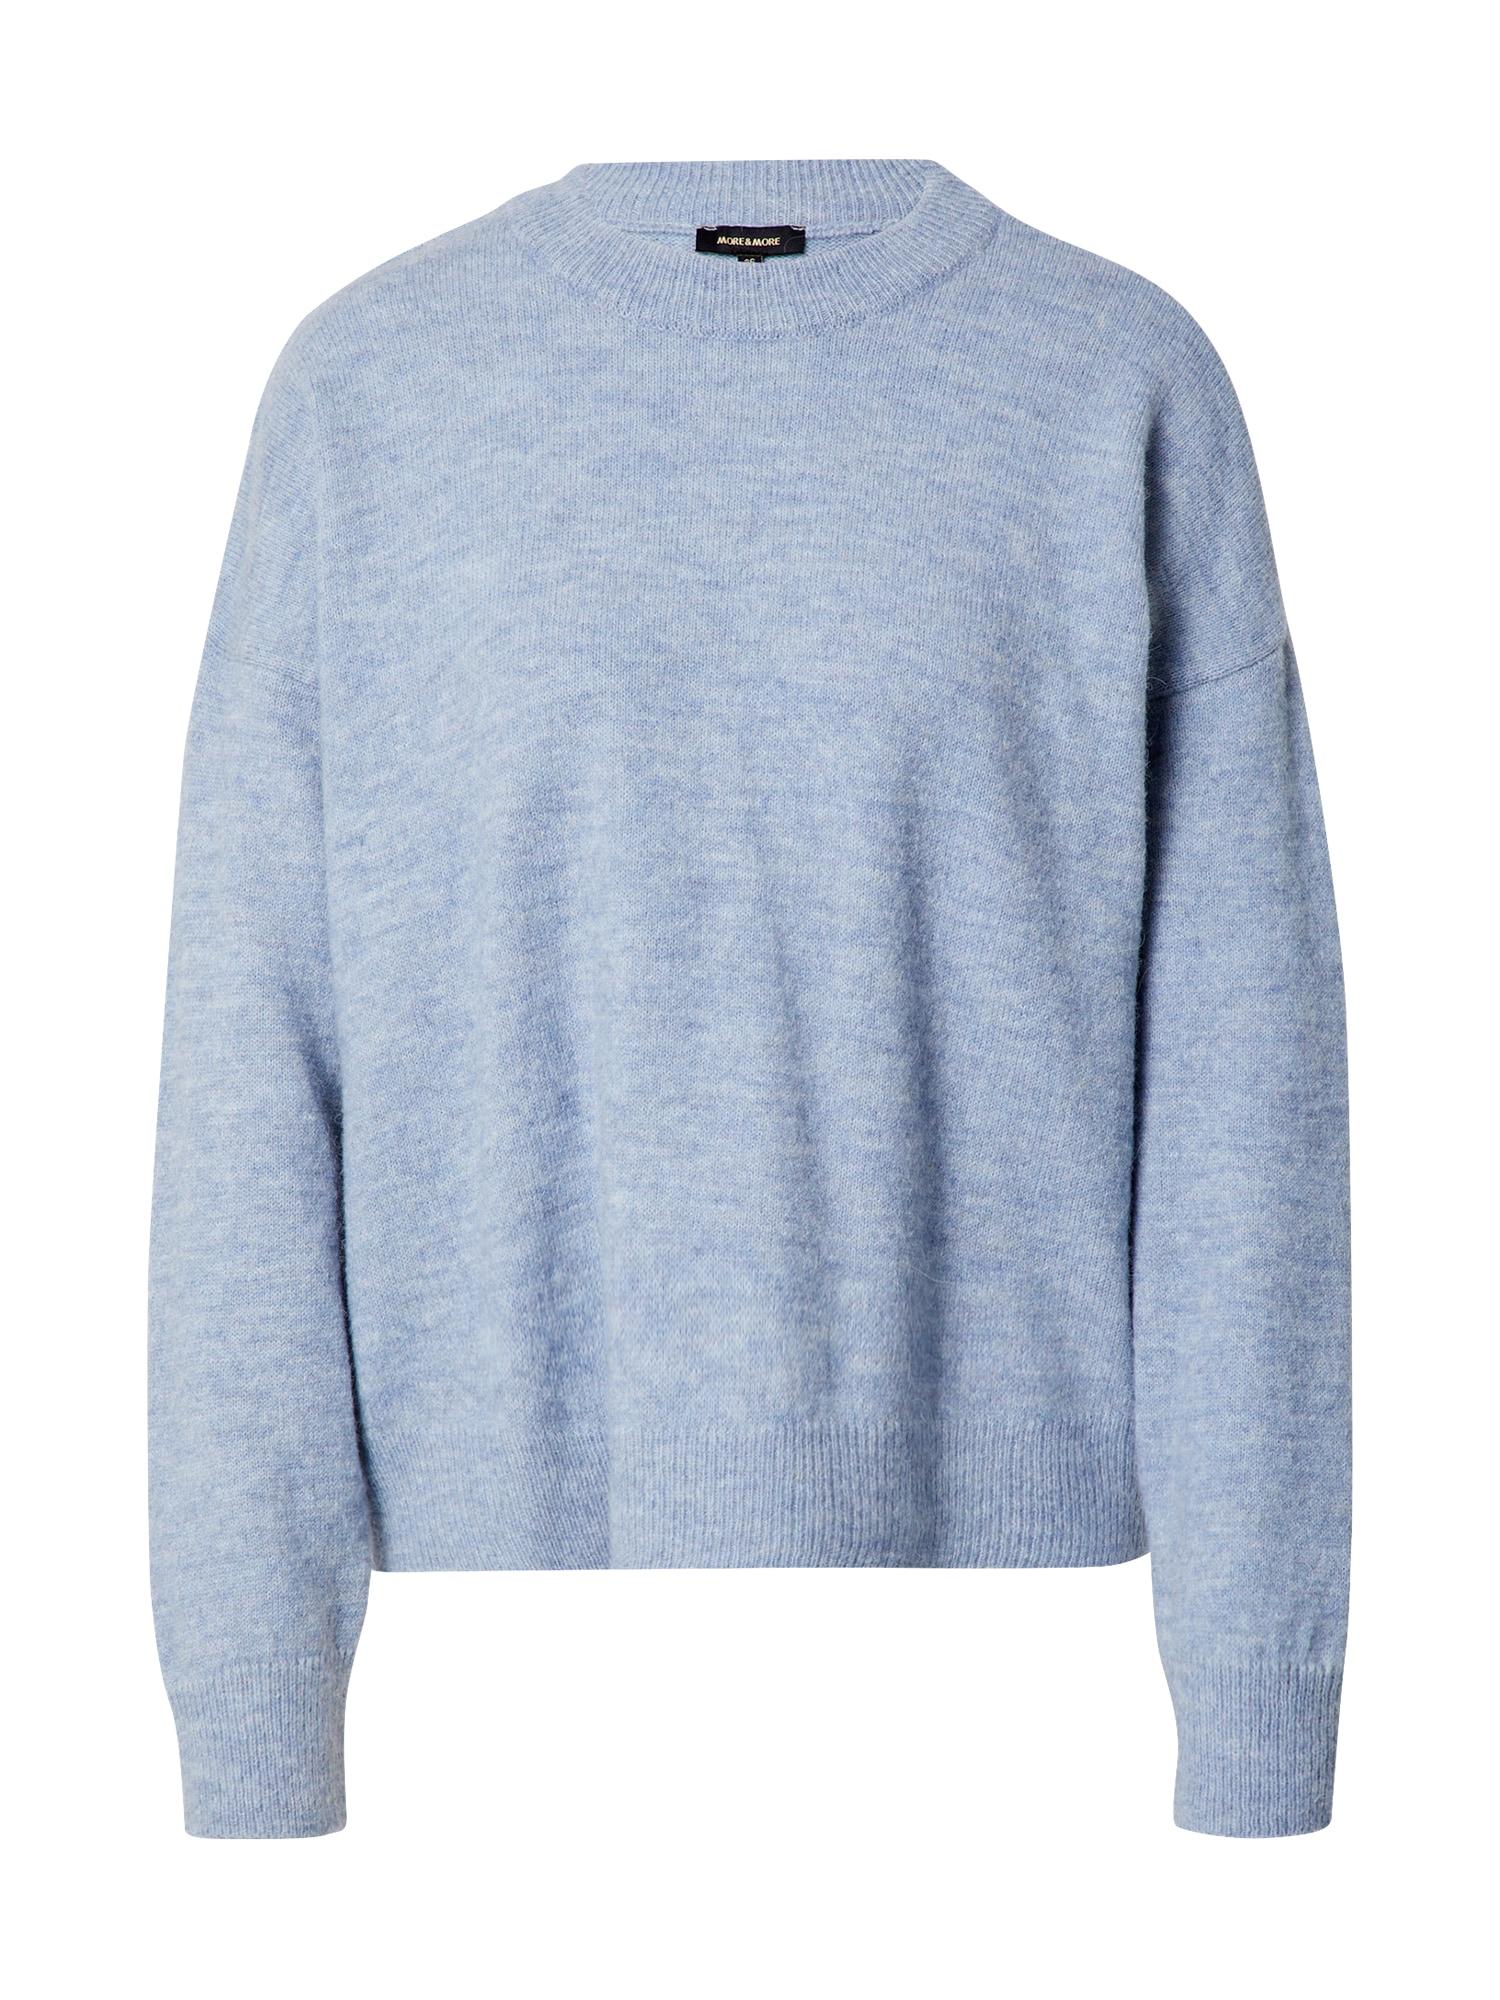 MORE & MORE Megztinis mėlyna dūmų spalva / marga smėlio spalva